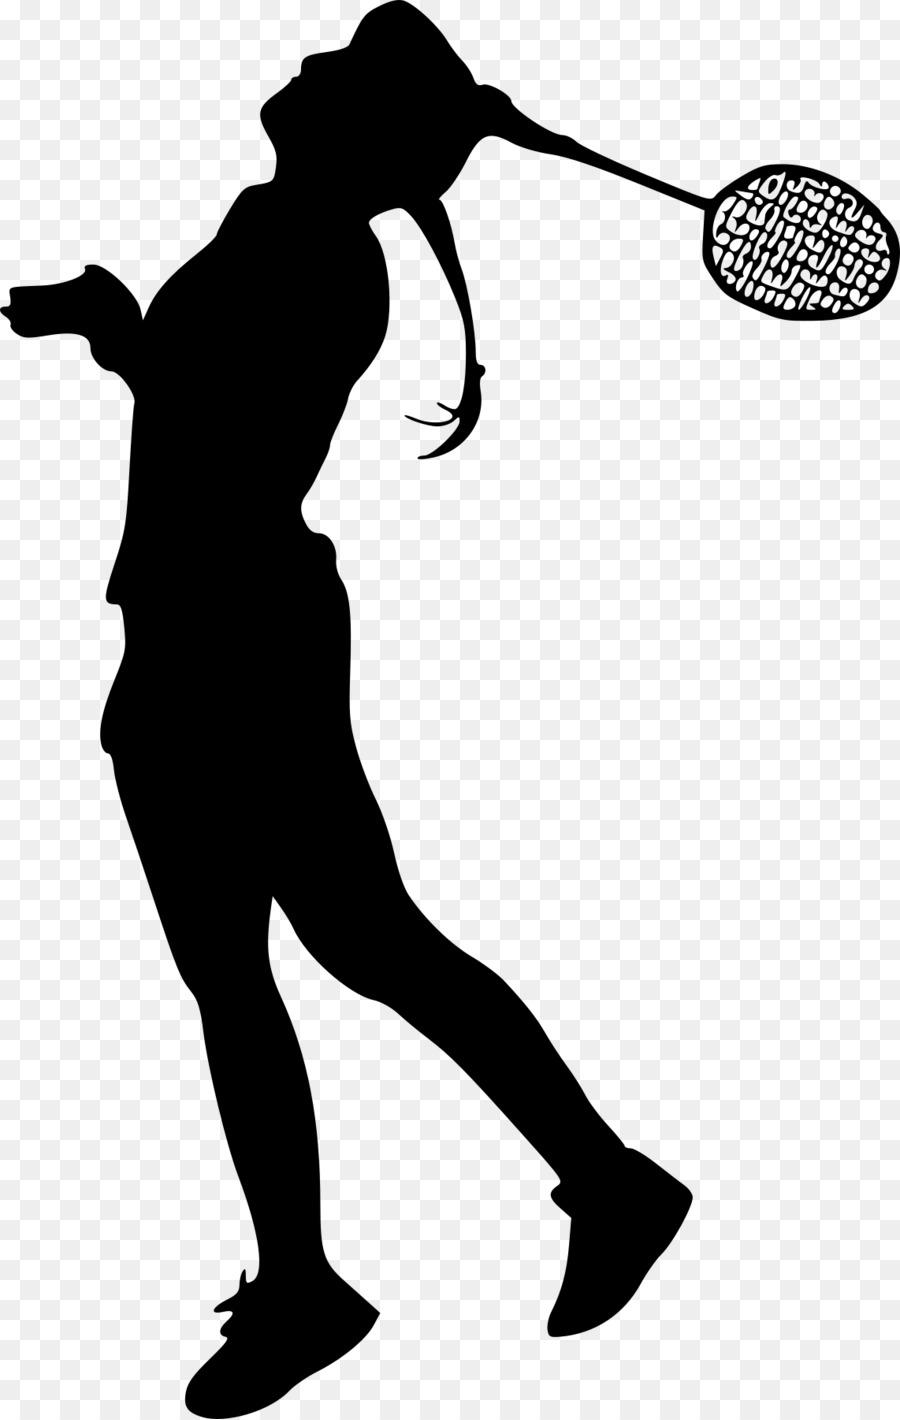 Background sports hand . Badminton clipart sport badminton